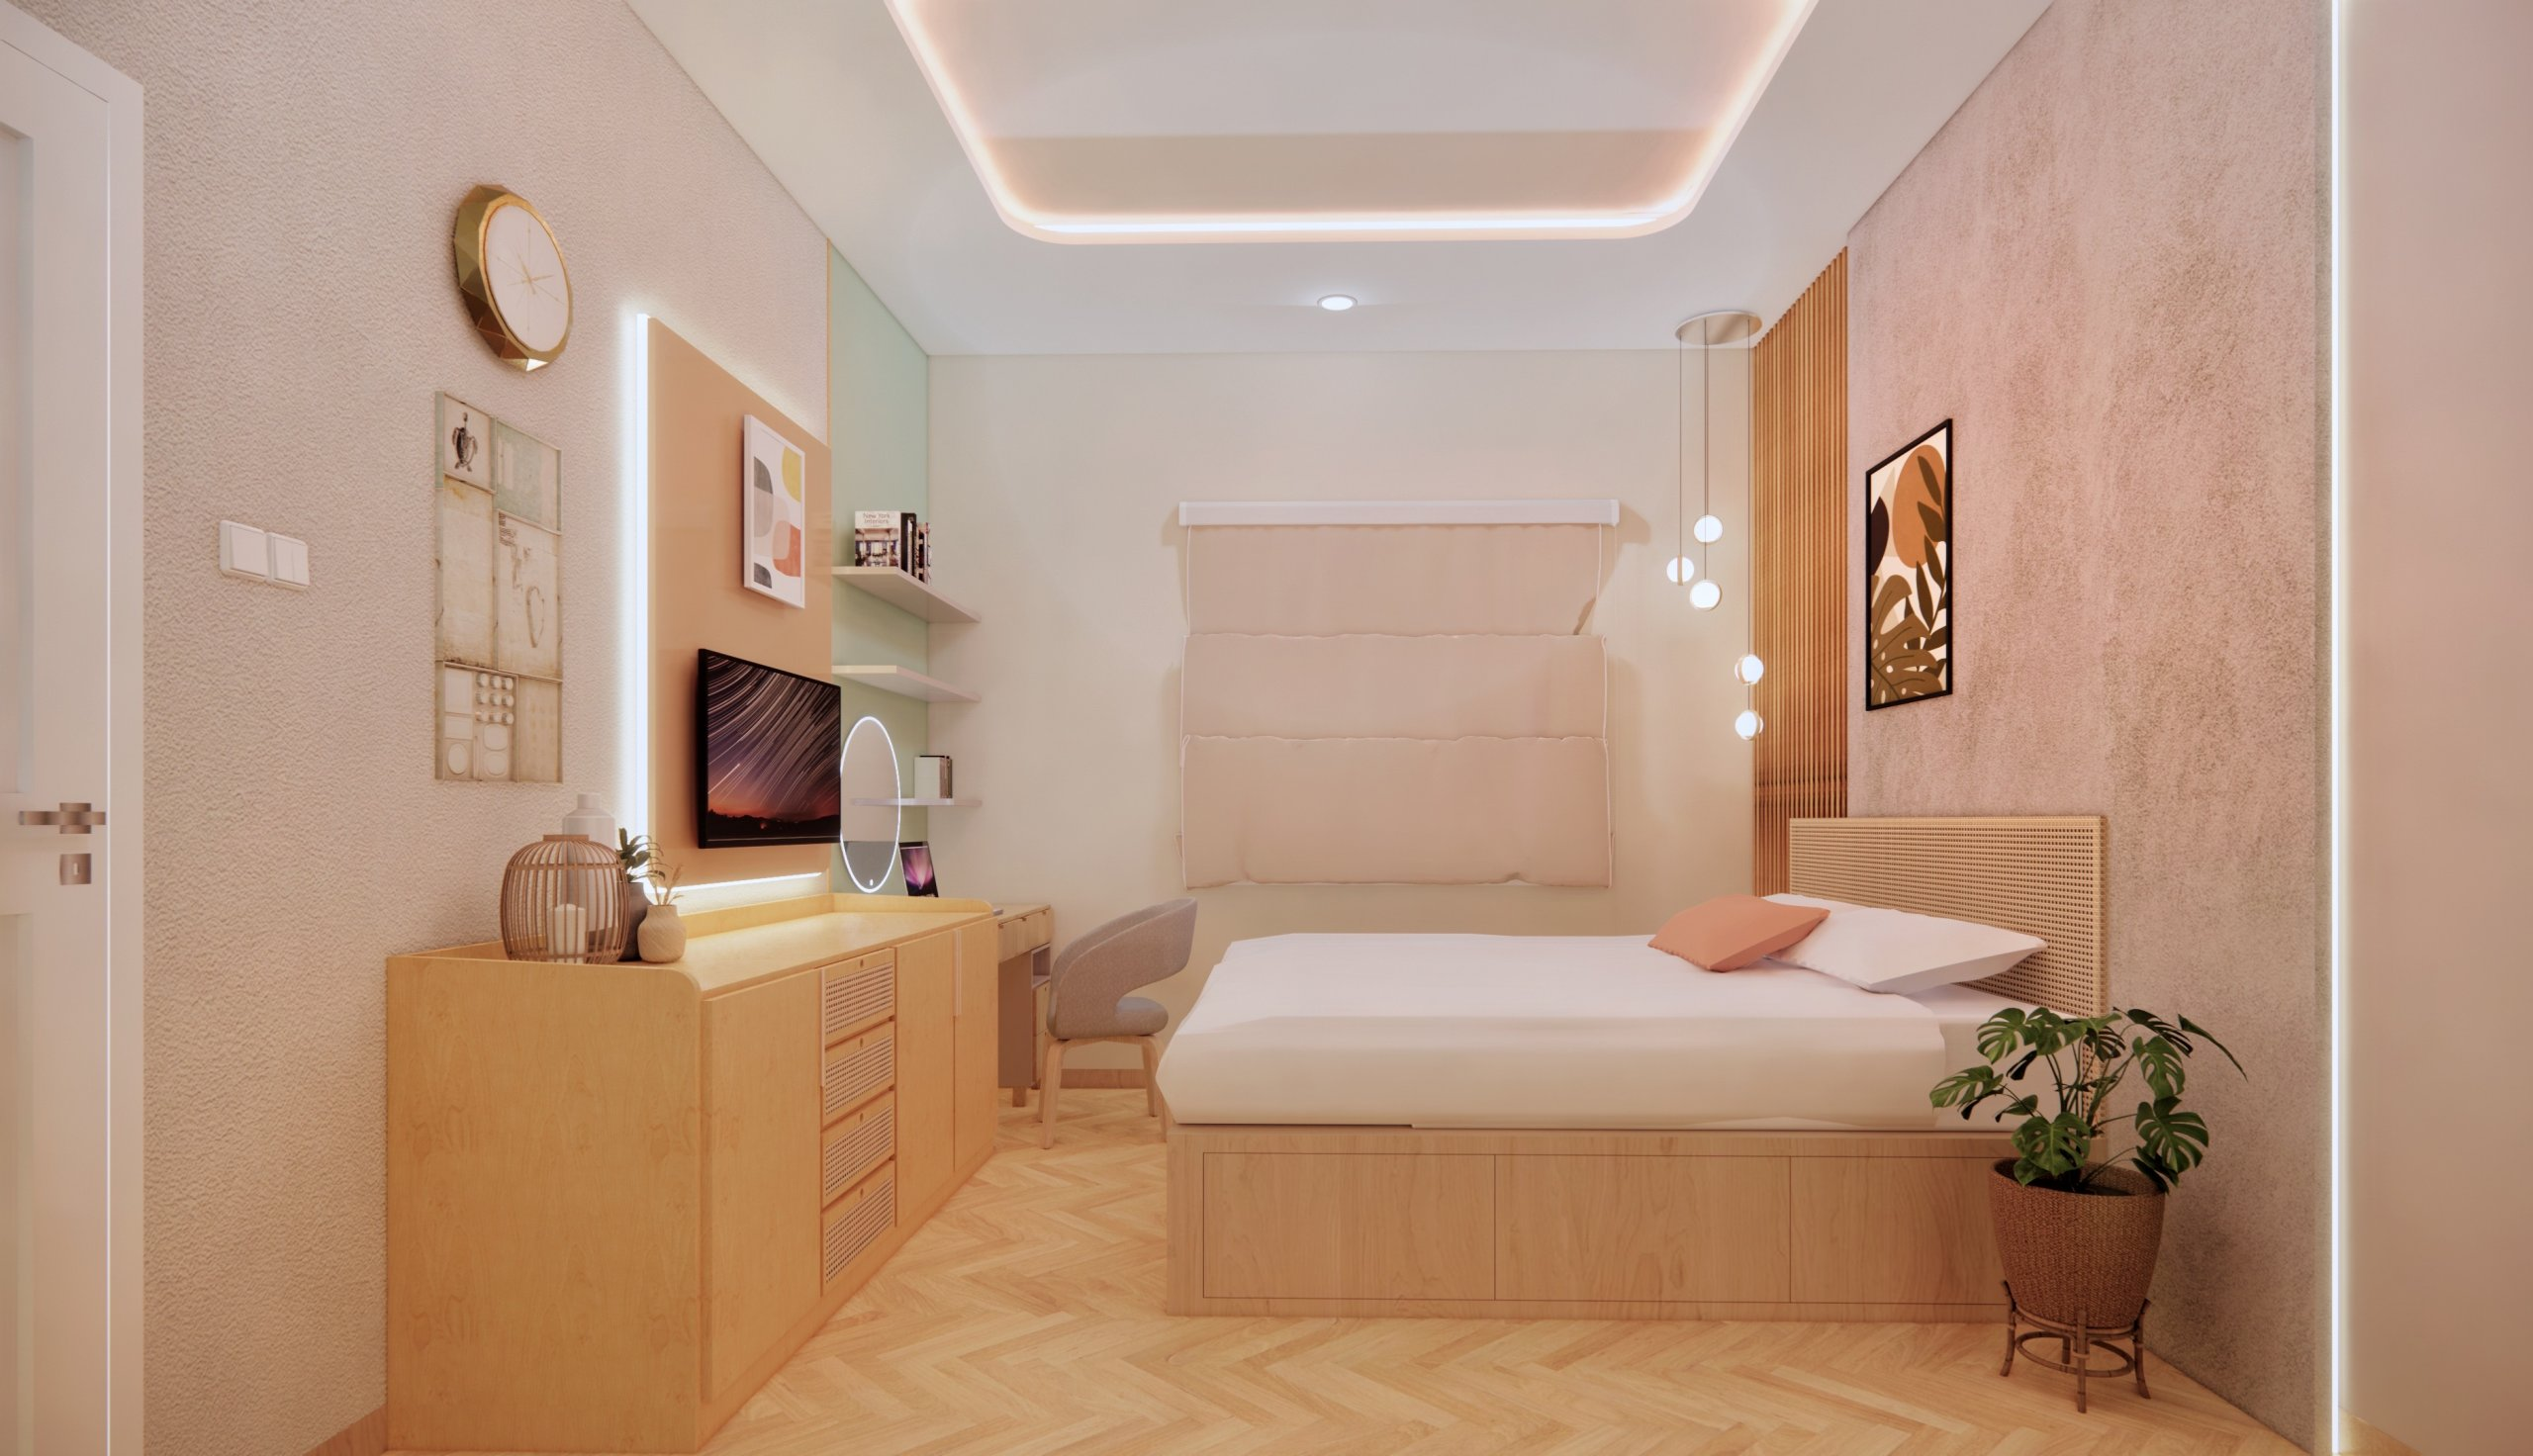 kamar tidur kontemporer